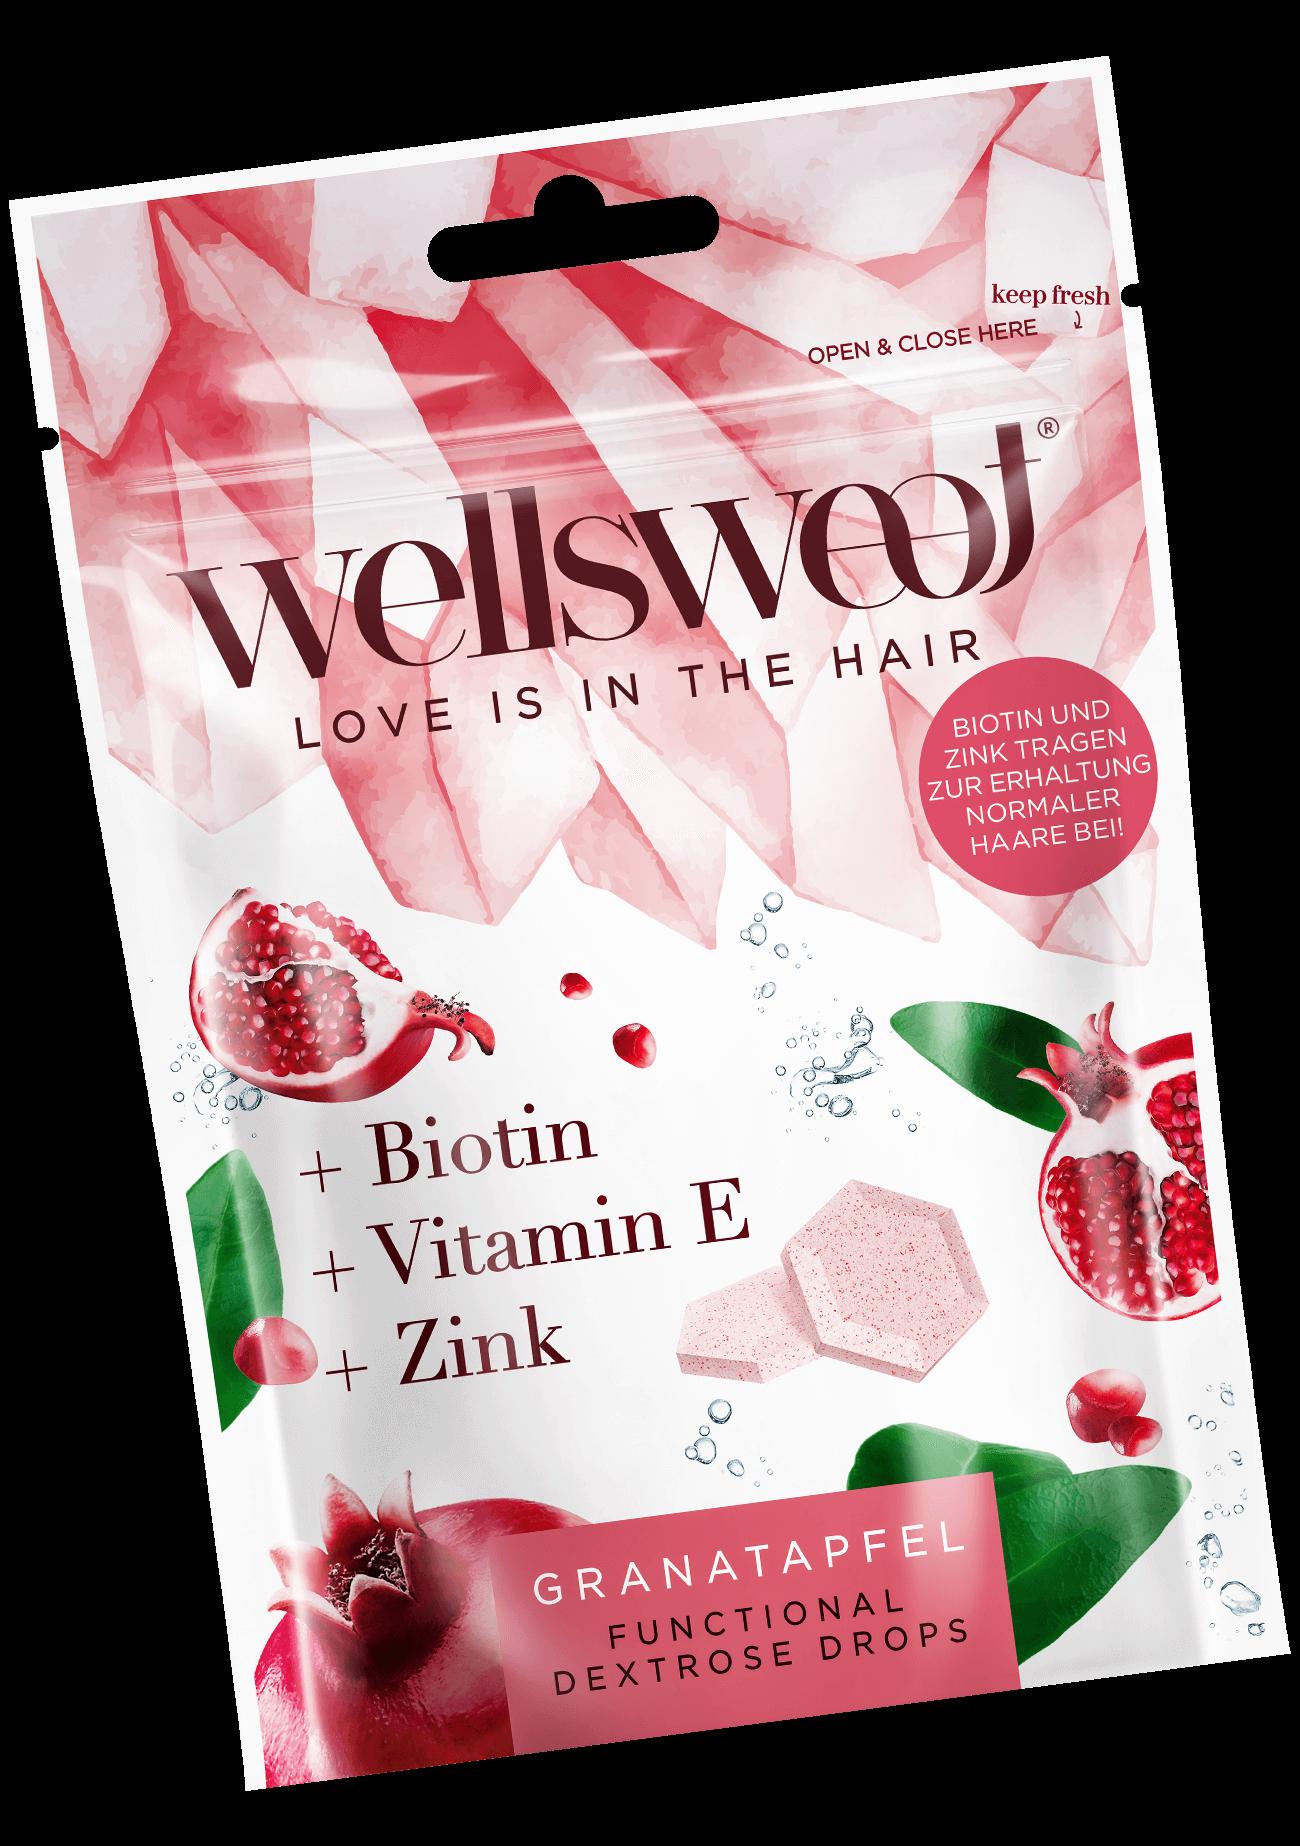 Wellsweet - Love is in the hair - Granatapfel Packung